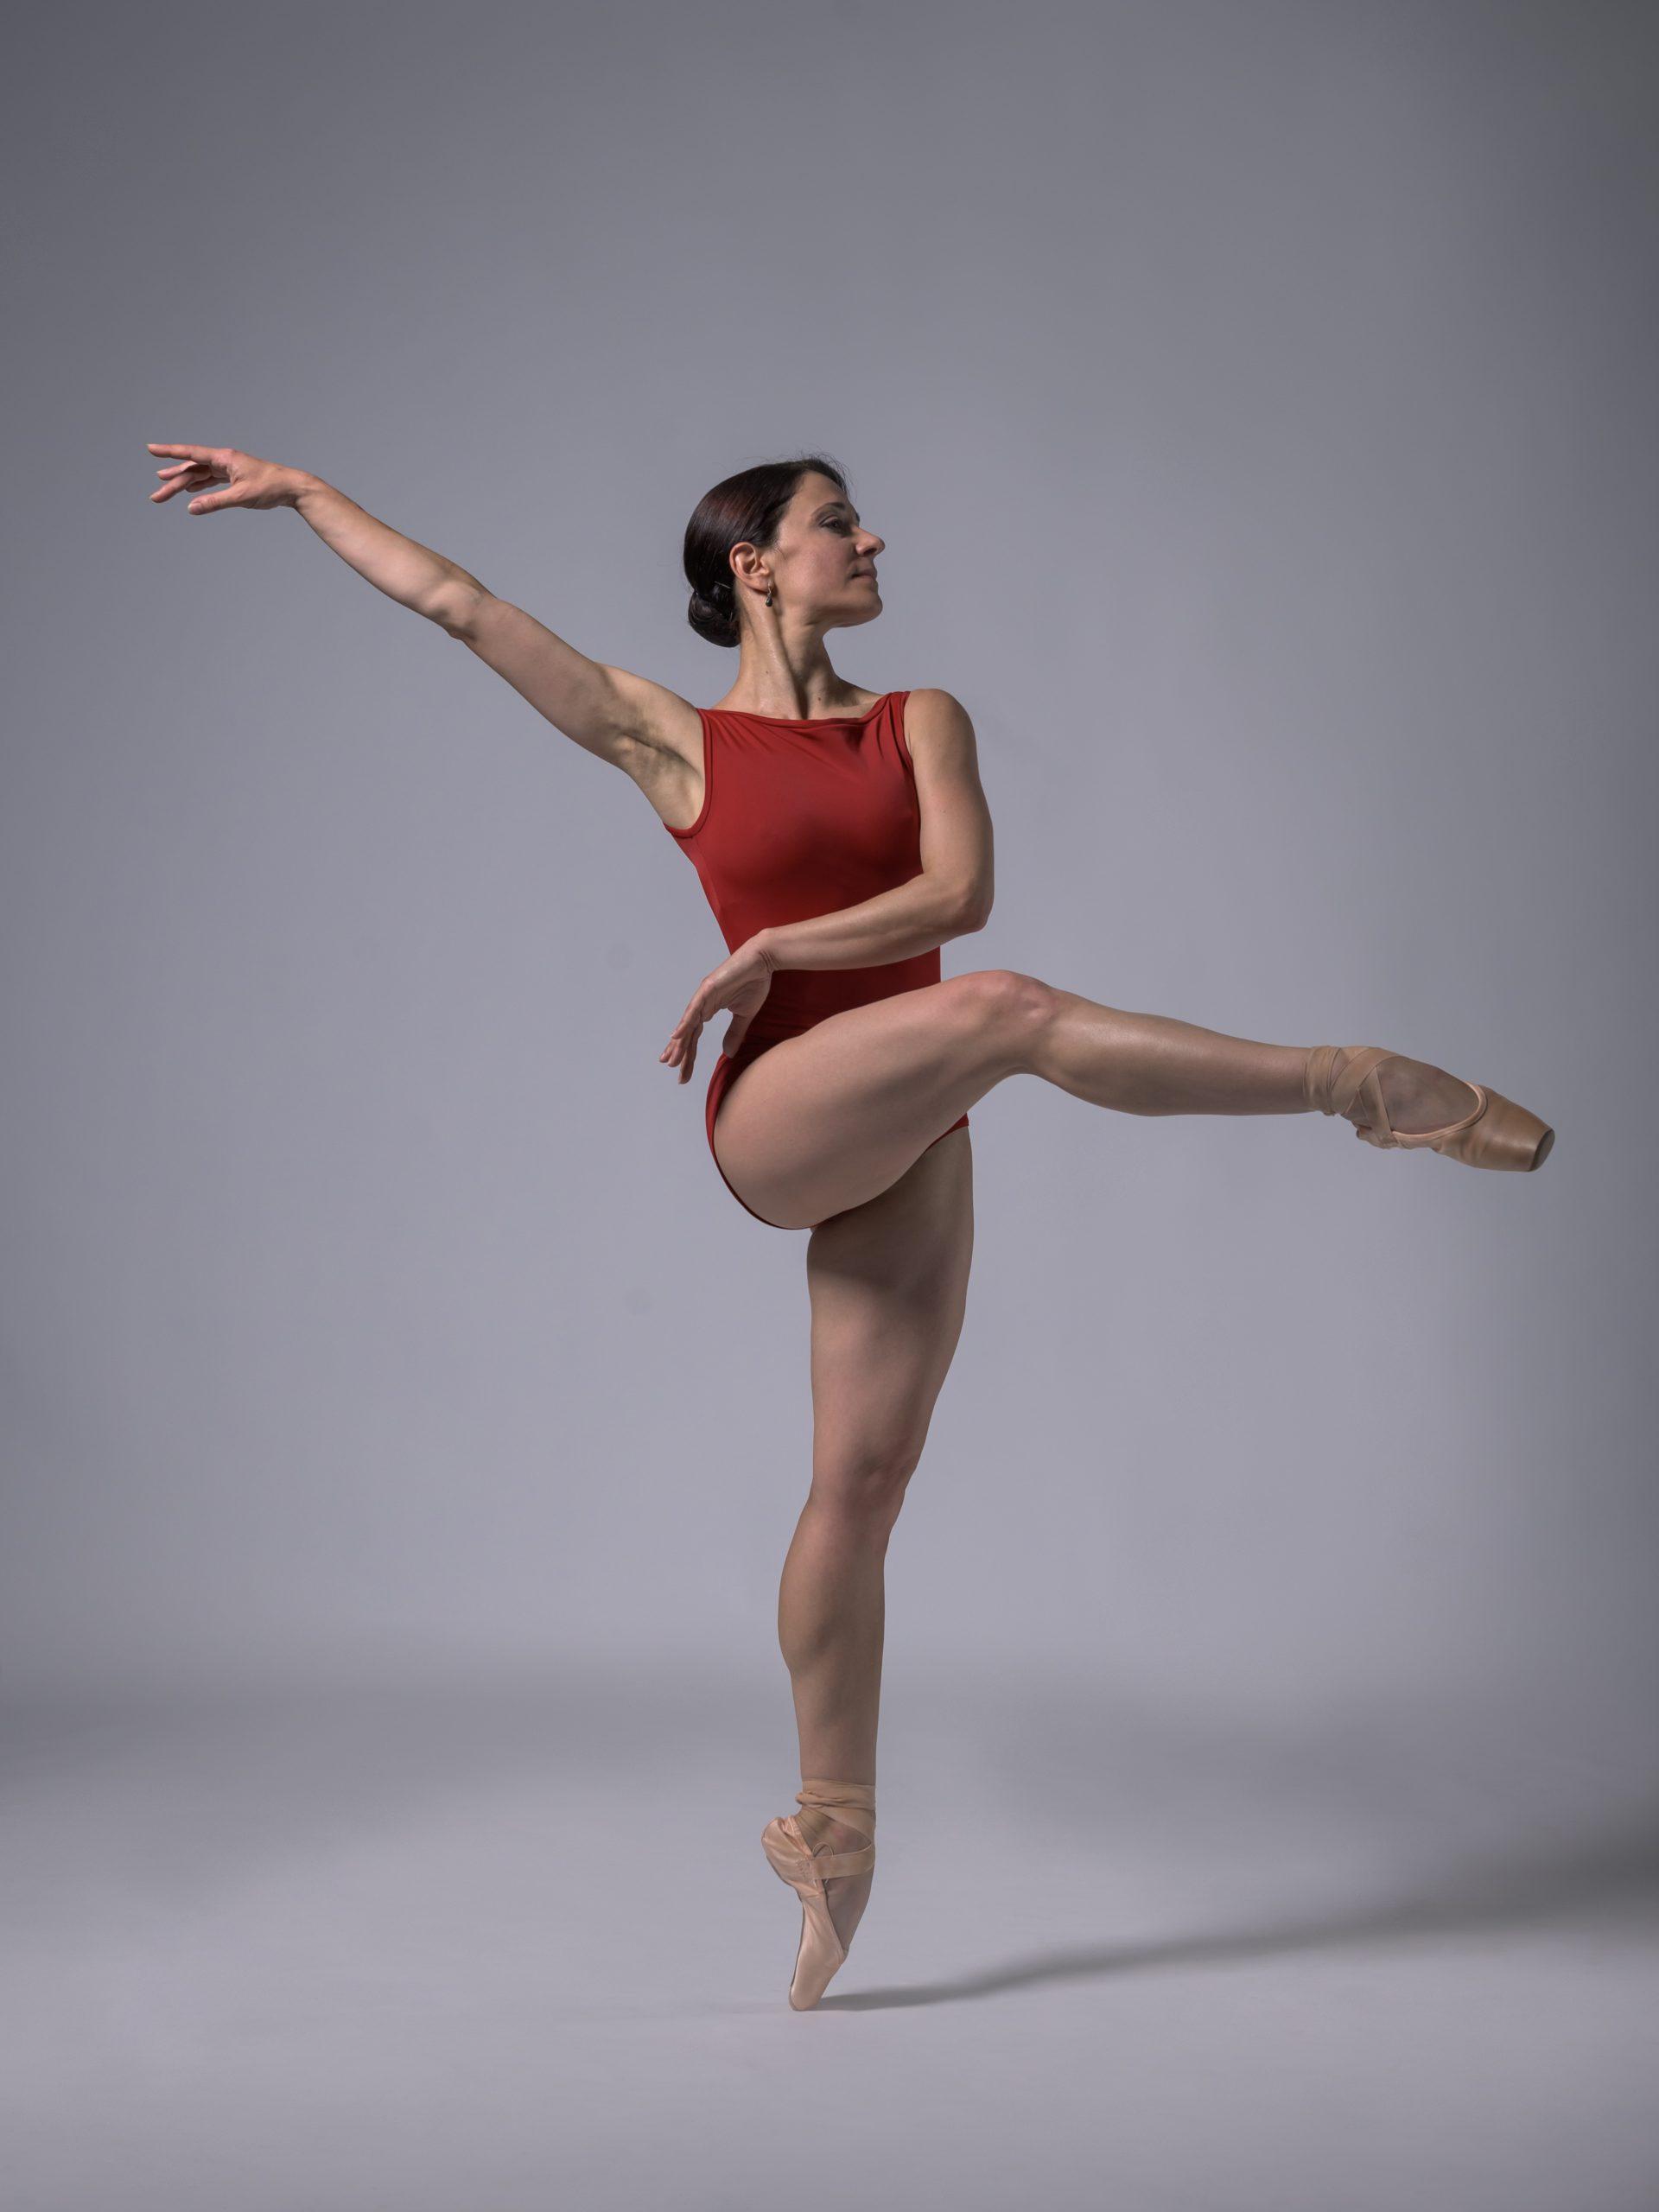 Nelka Lazovic